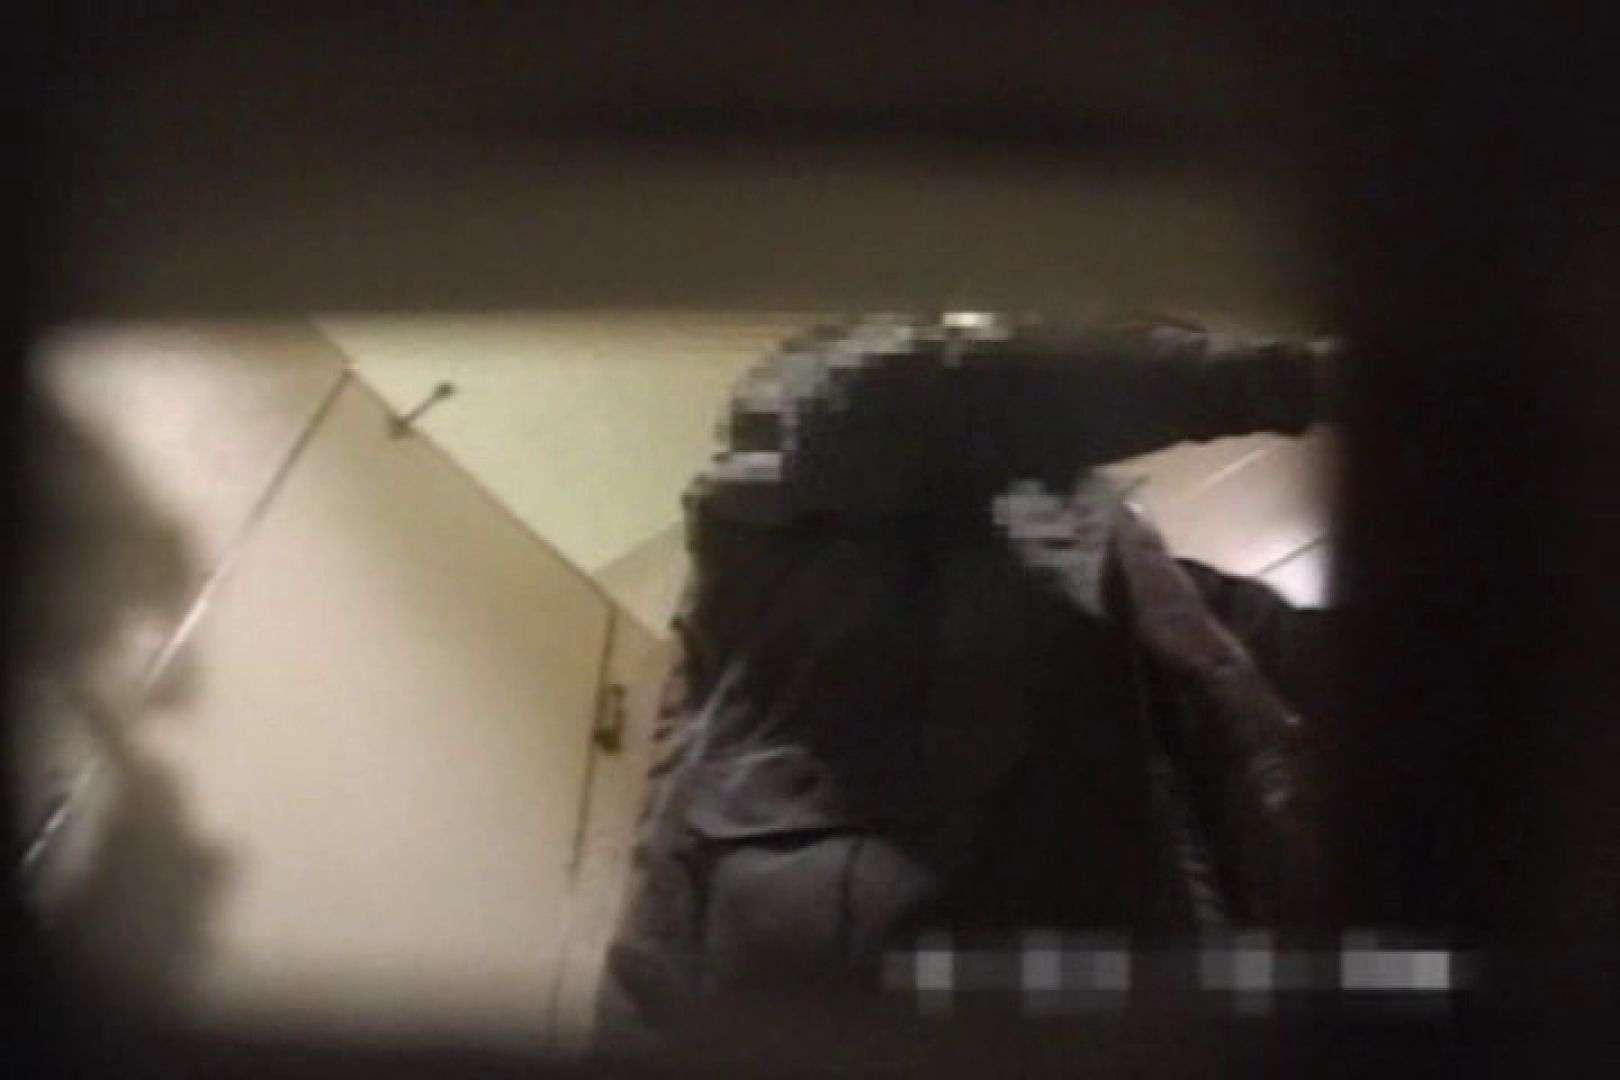 STY-013 実録!2カメde女子洗面所 名作 のぞき動画画像 52連発 2